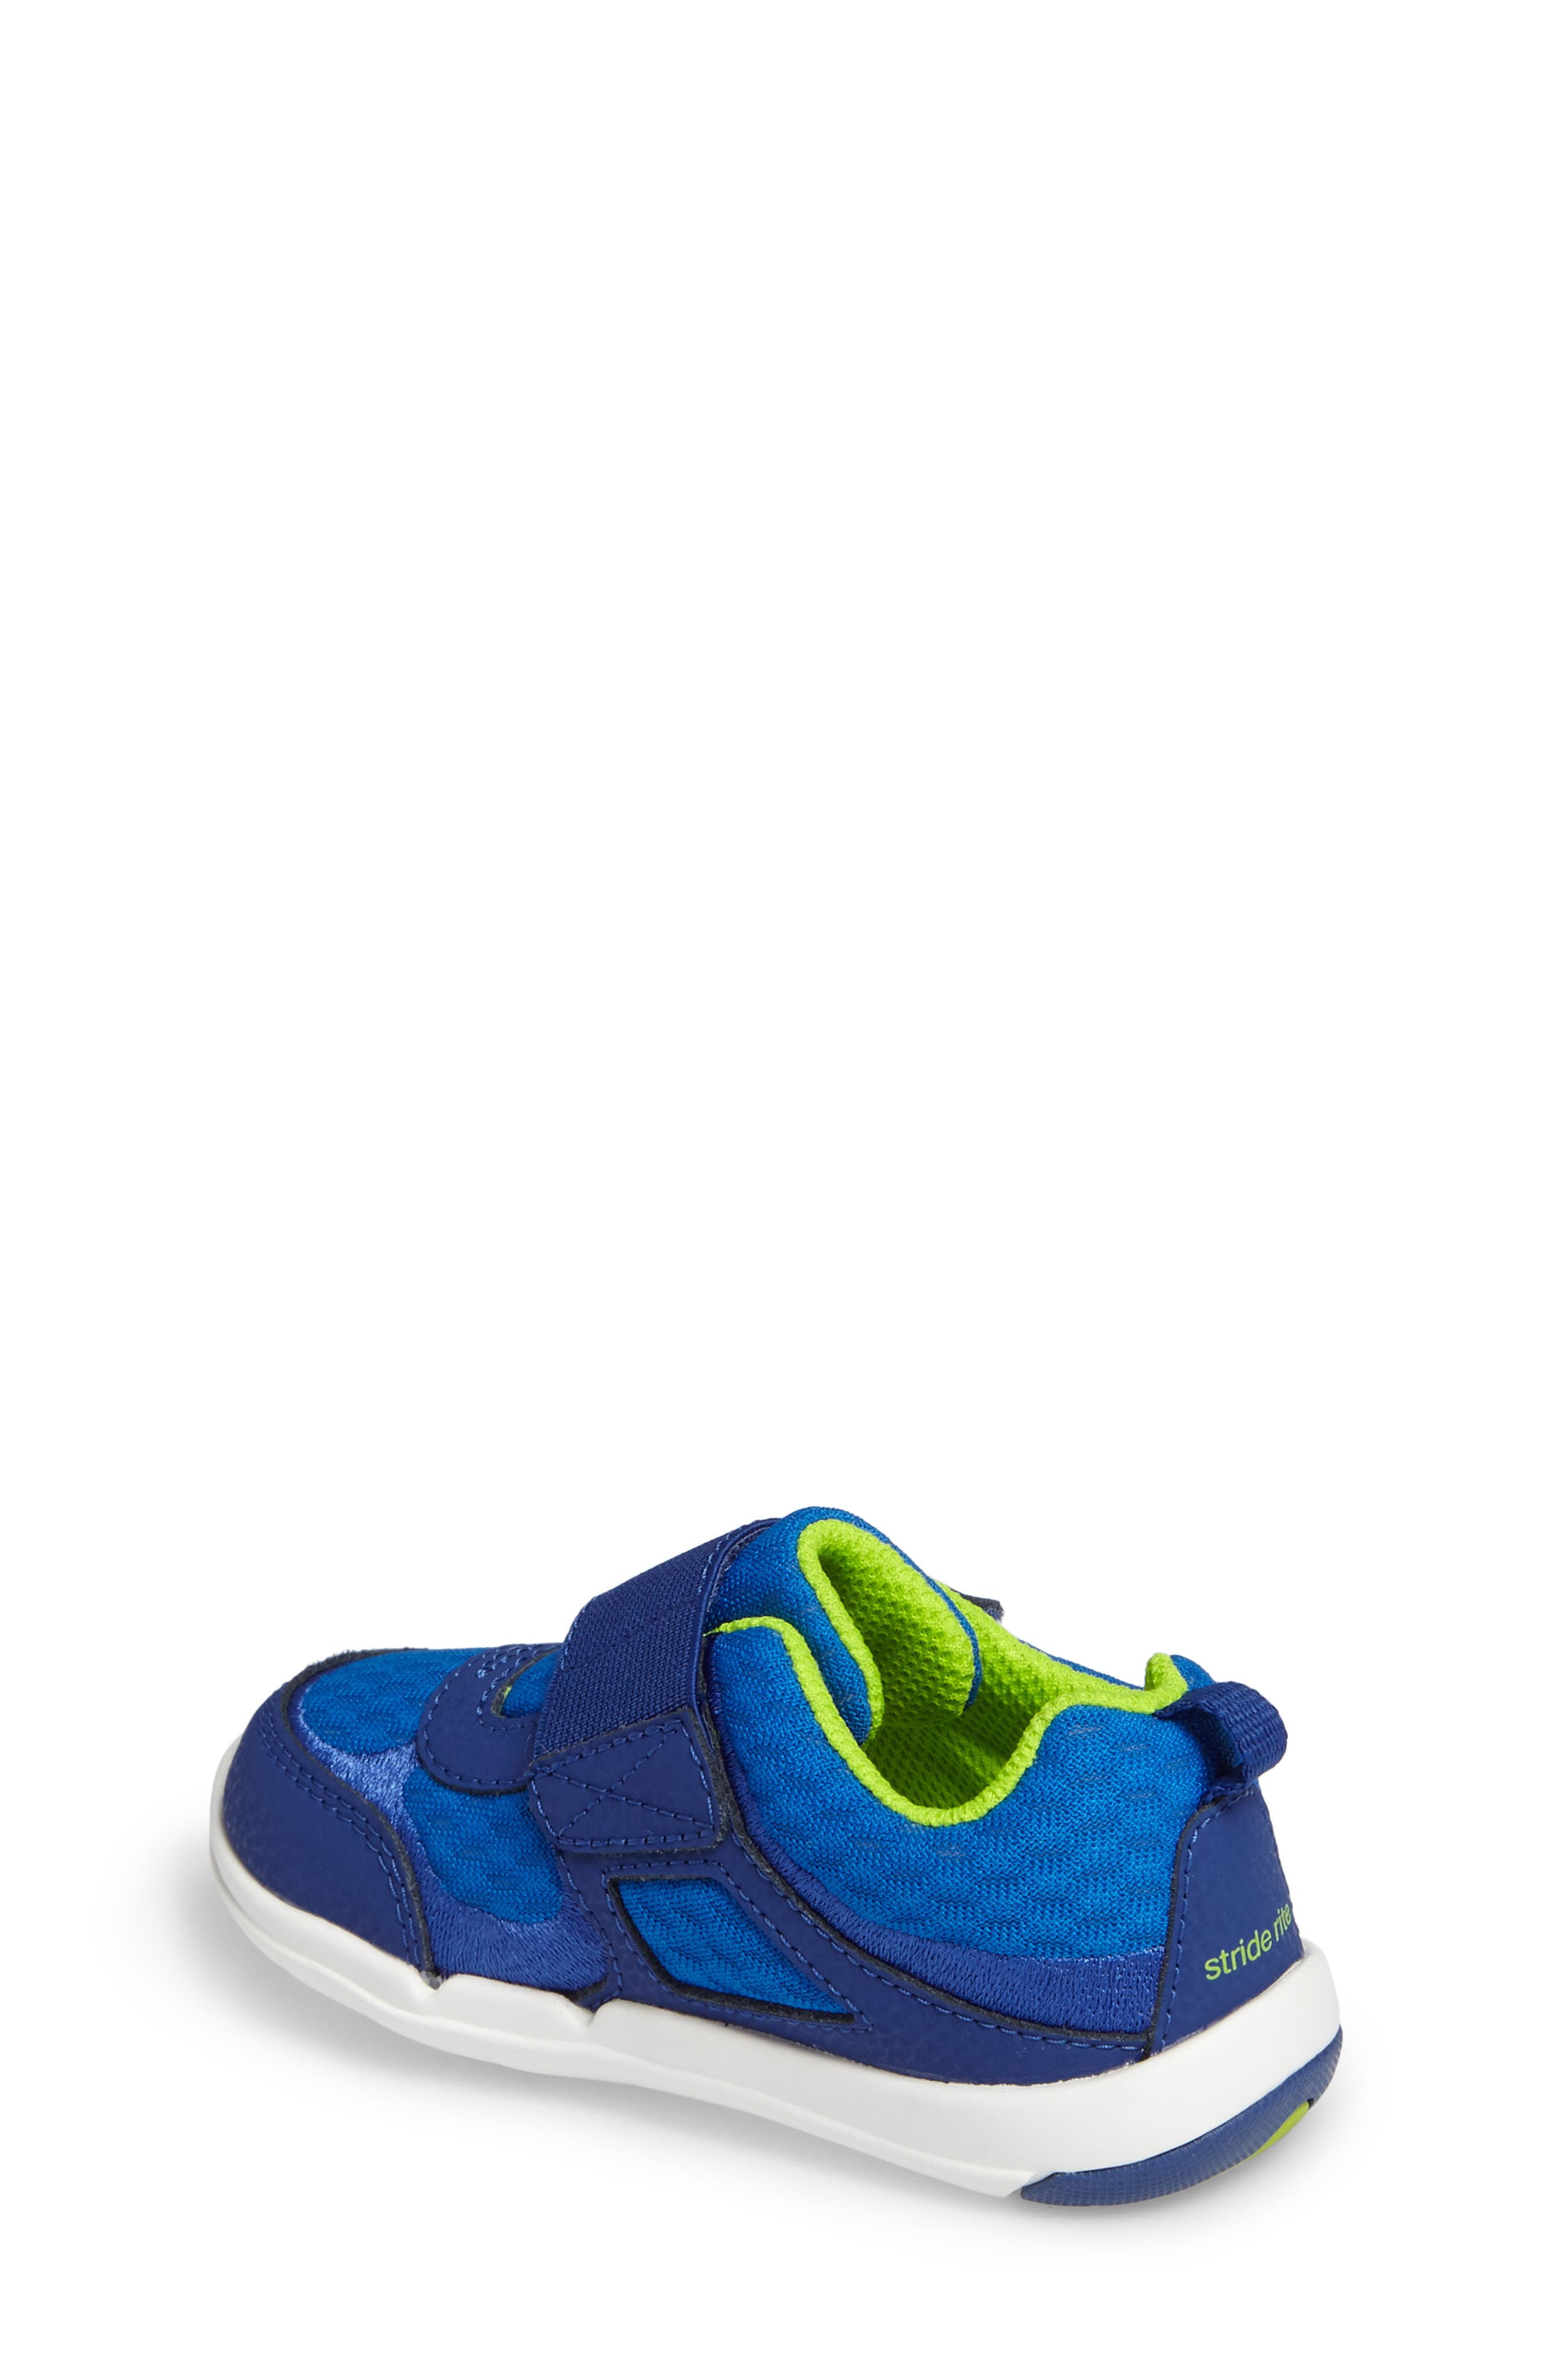 Alternate Image 2  - Stride Rite Casey Sneaker (Baby, Toddler & Walker)